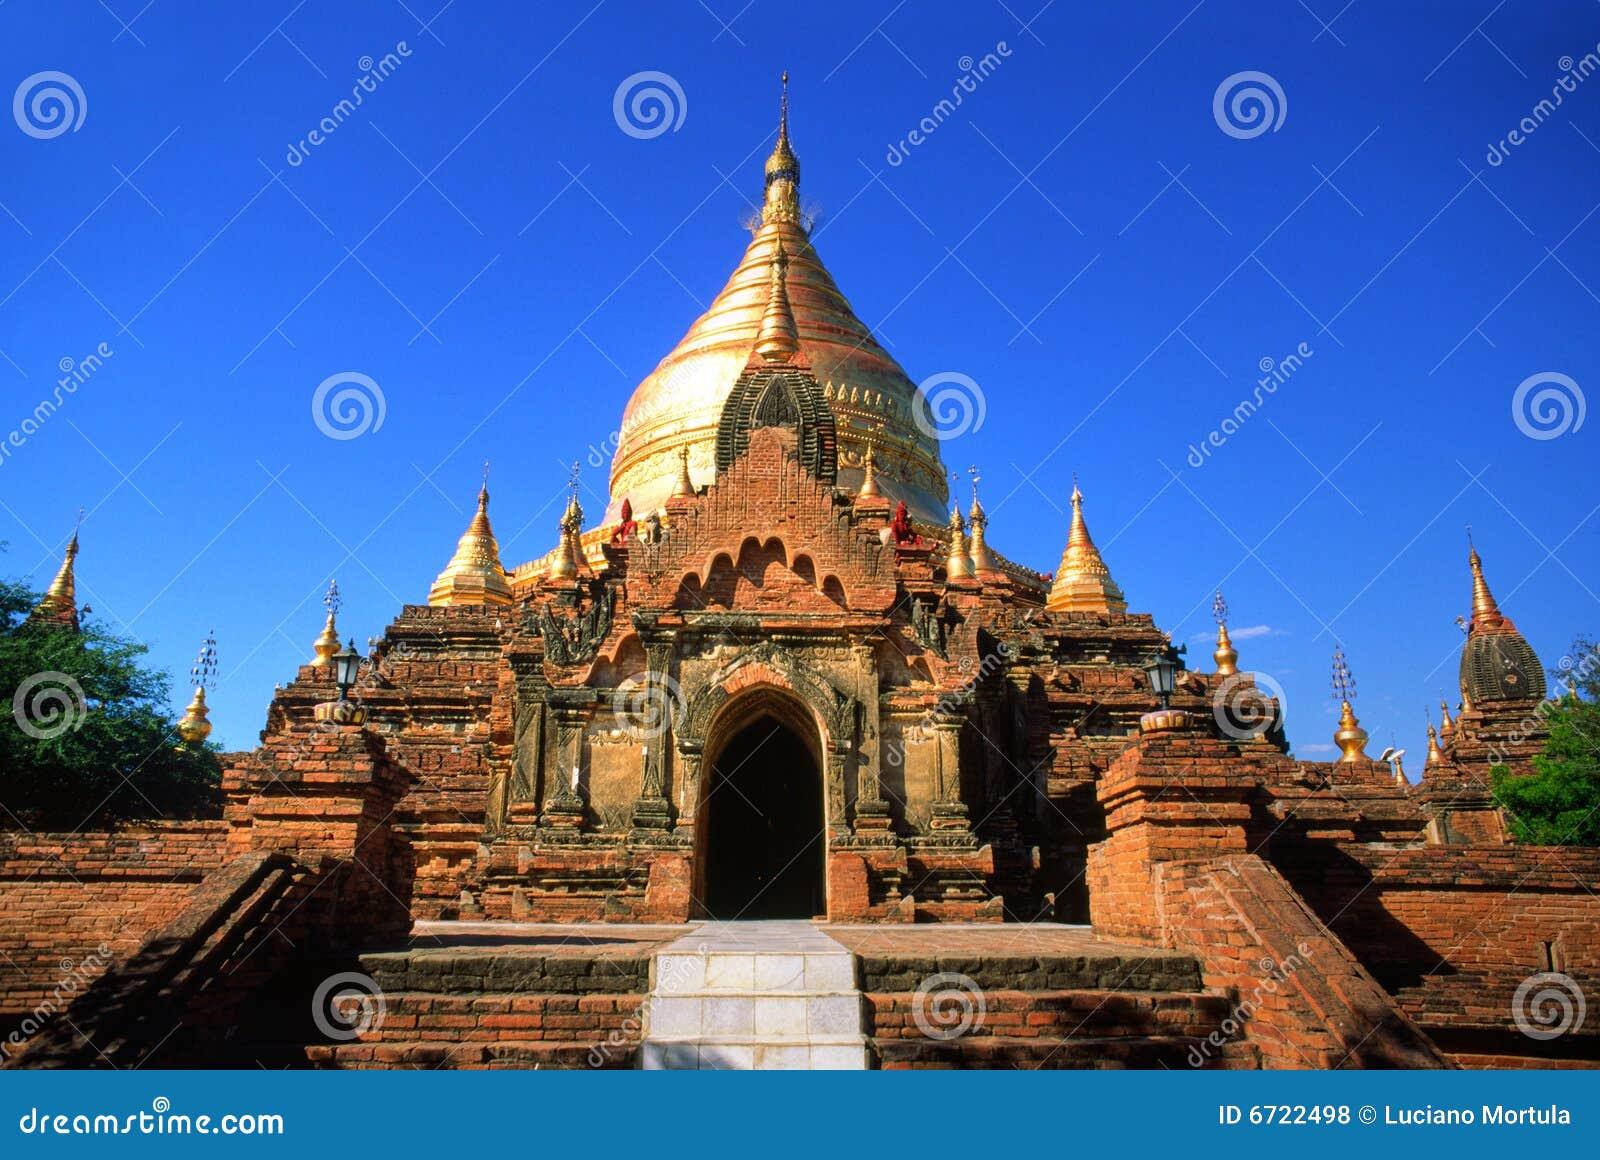 Beautiful Temple In Bagan Myanmar Stock Photo Image Math Wallpaper Golden Find Free HD for Desktop [pastnedes.tk]